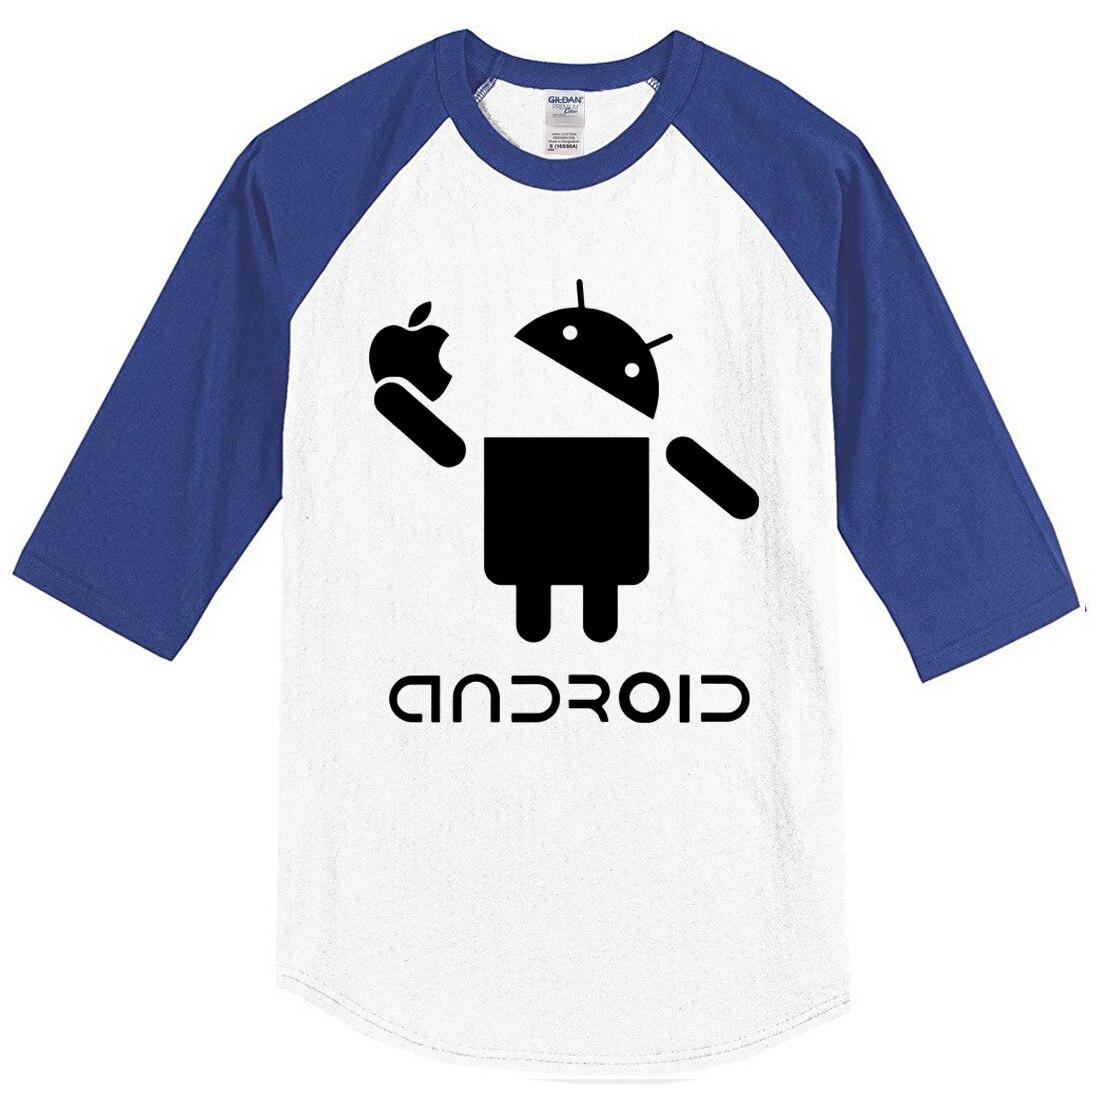 eed4e574bbc4 Android sommer 2017 T shirt baumwolle drei viertel sleeve herren T shirts  mode lässig raglan t shirt harajuku crossfit marke in Android sommer 2017 T- shirt ...